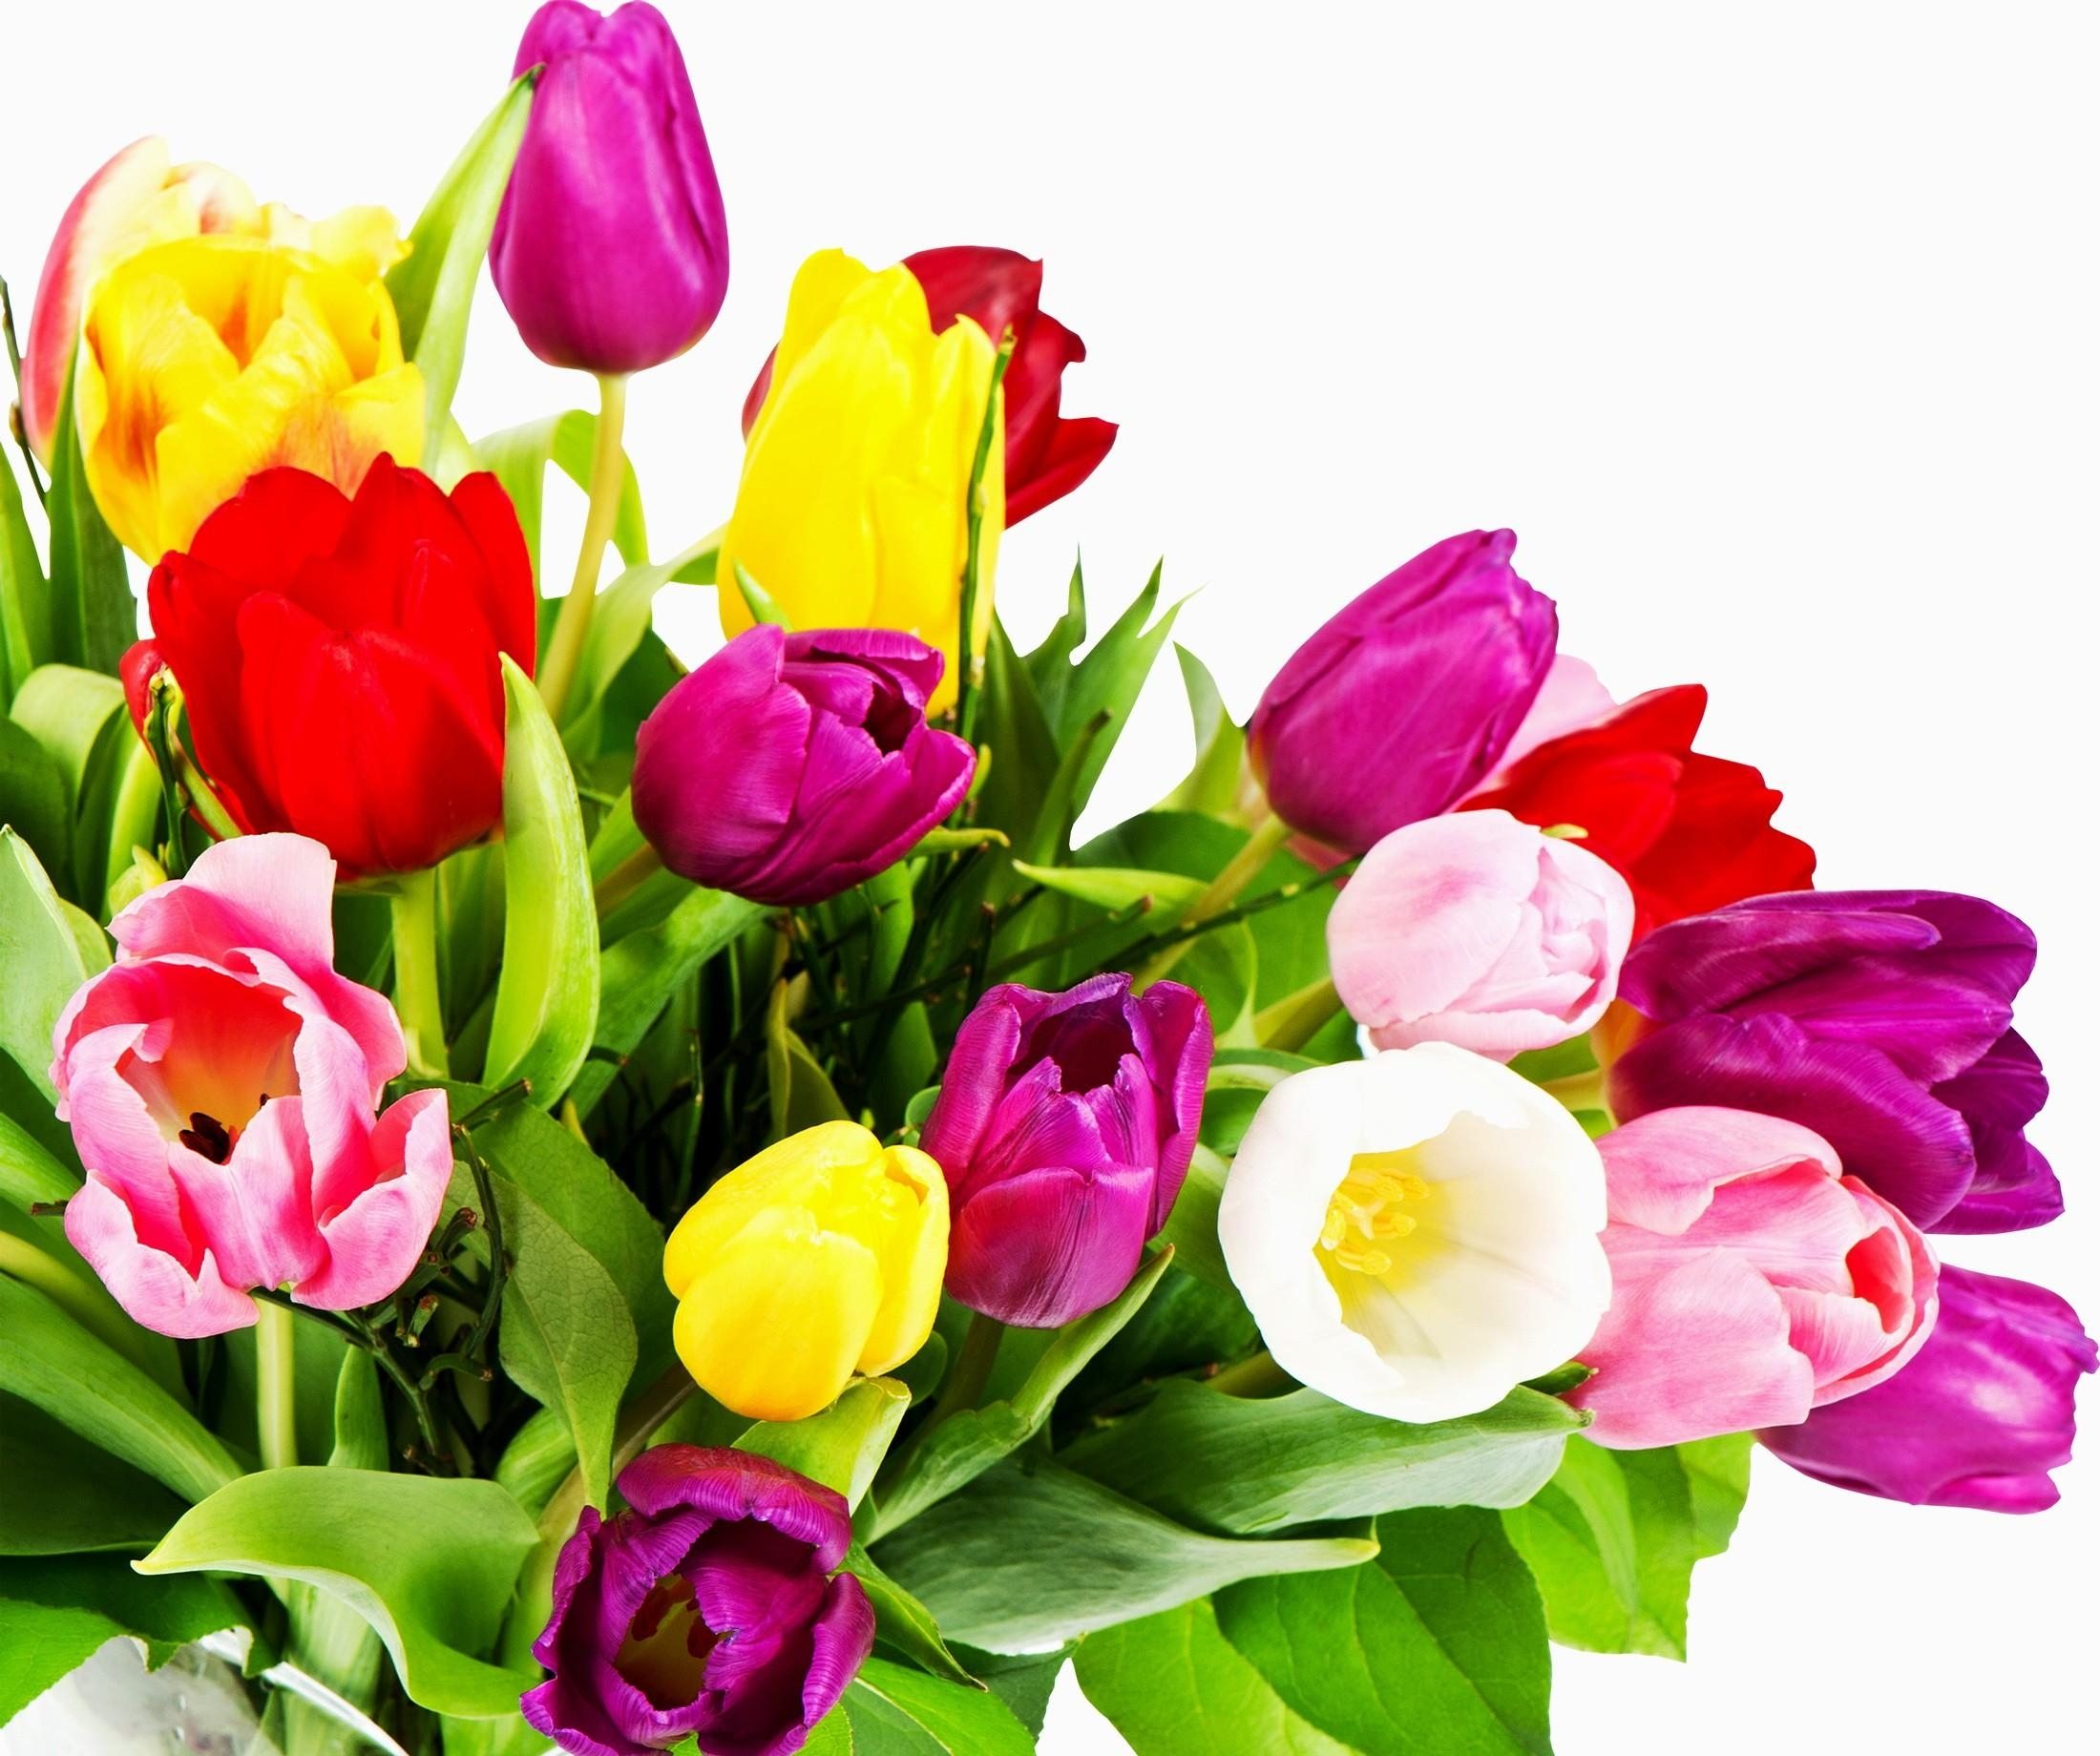 Goodfon Wallpaper Car Wallpaper Tulips Flowers Bouquet Bright Colorful